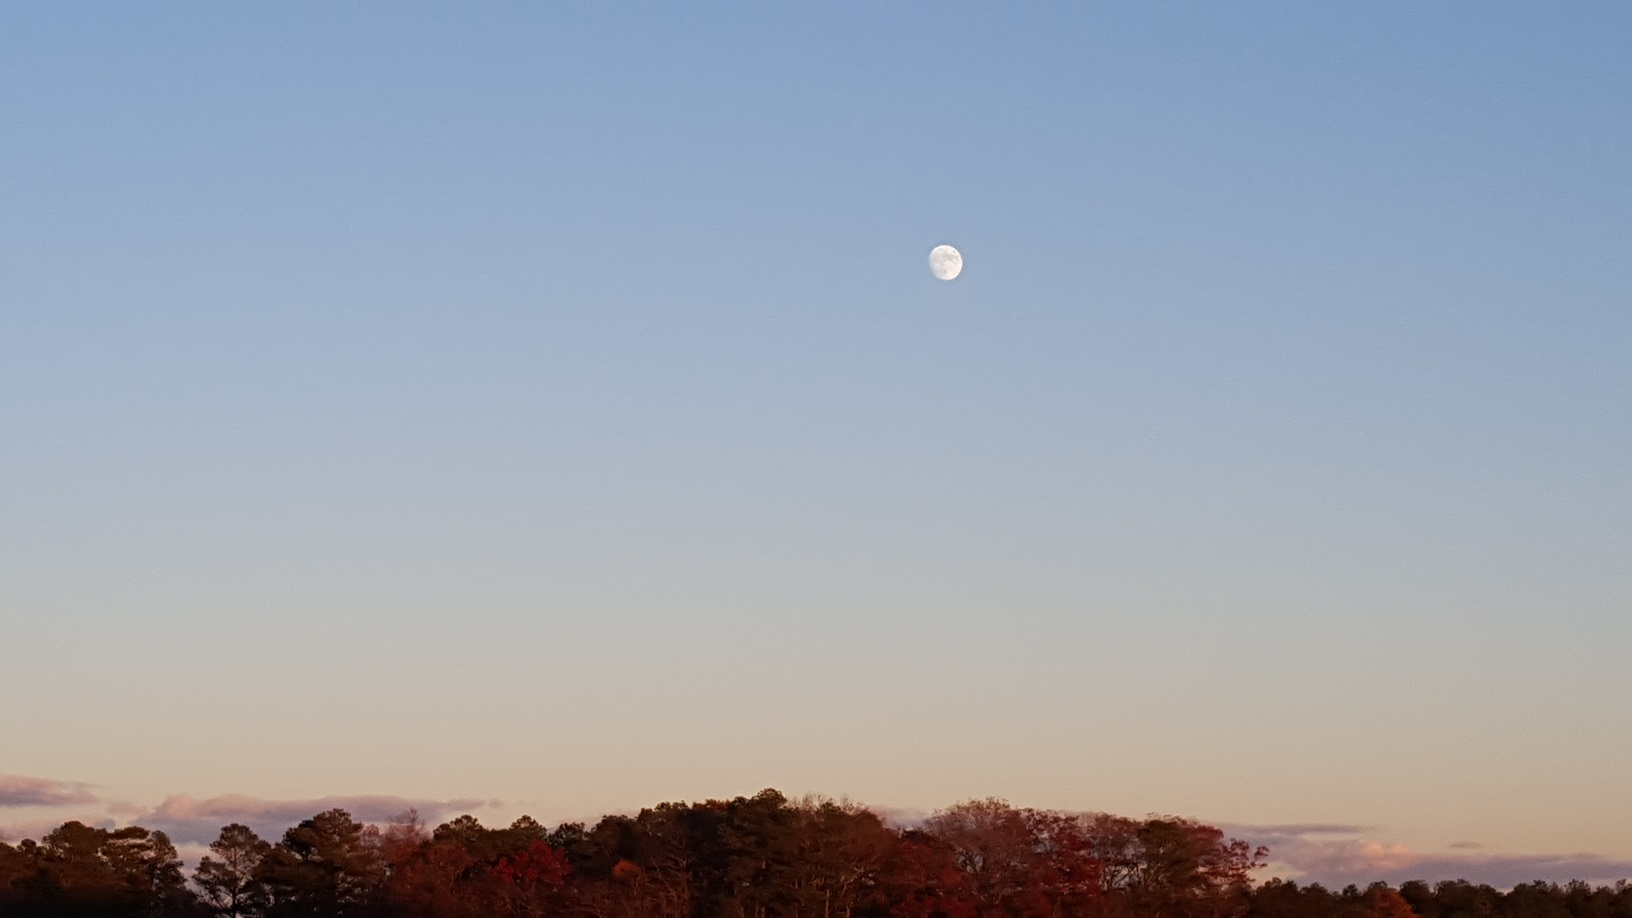 beaver moon, hunters moon,frosty moon, november full moon, 2015, delaware, sussex county